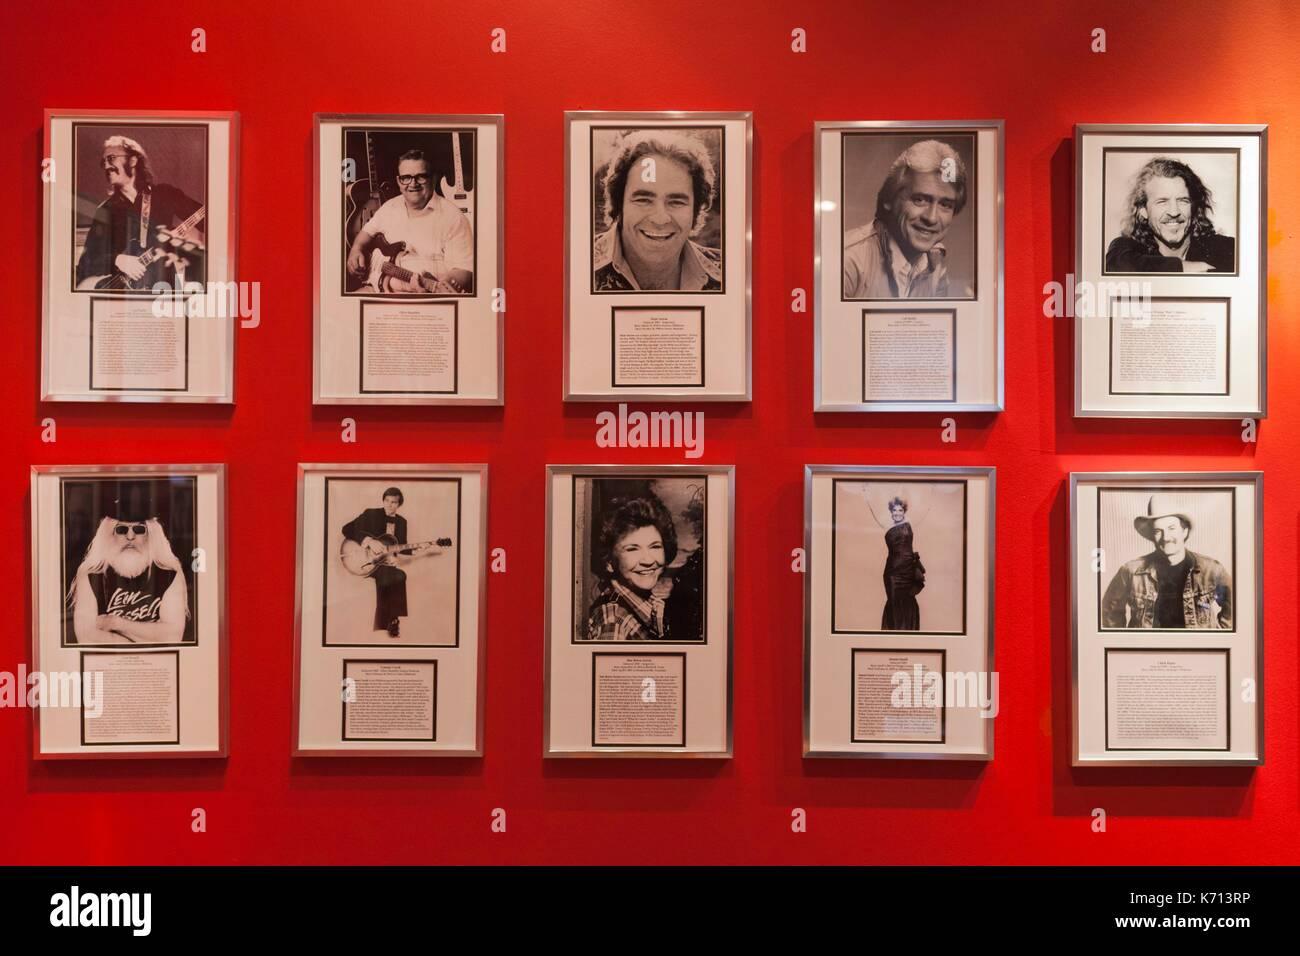 United States, Oklahoma, Muskogee, Oklahoma Music Hall of Fame, photographs of famous Oklahoma musicians Stock Photo